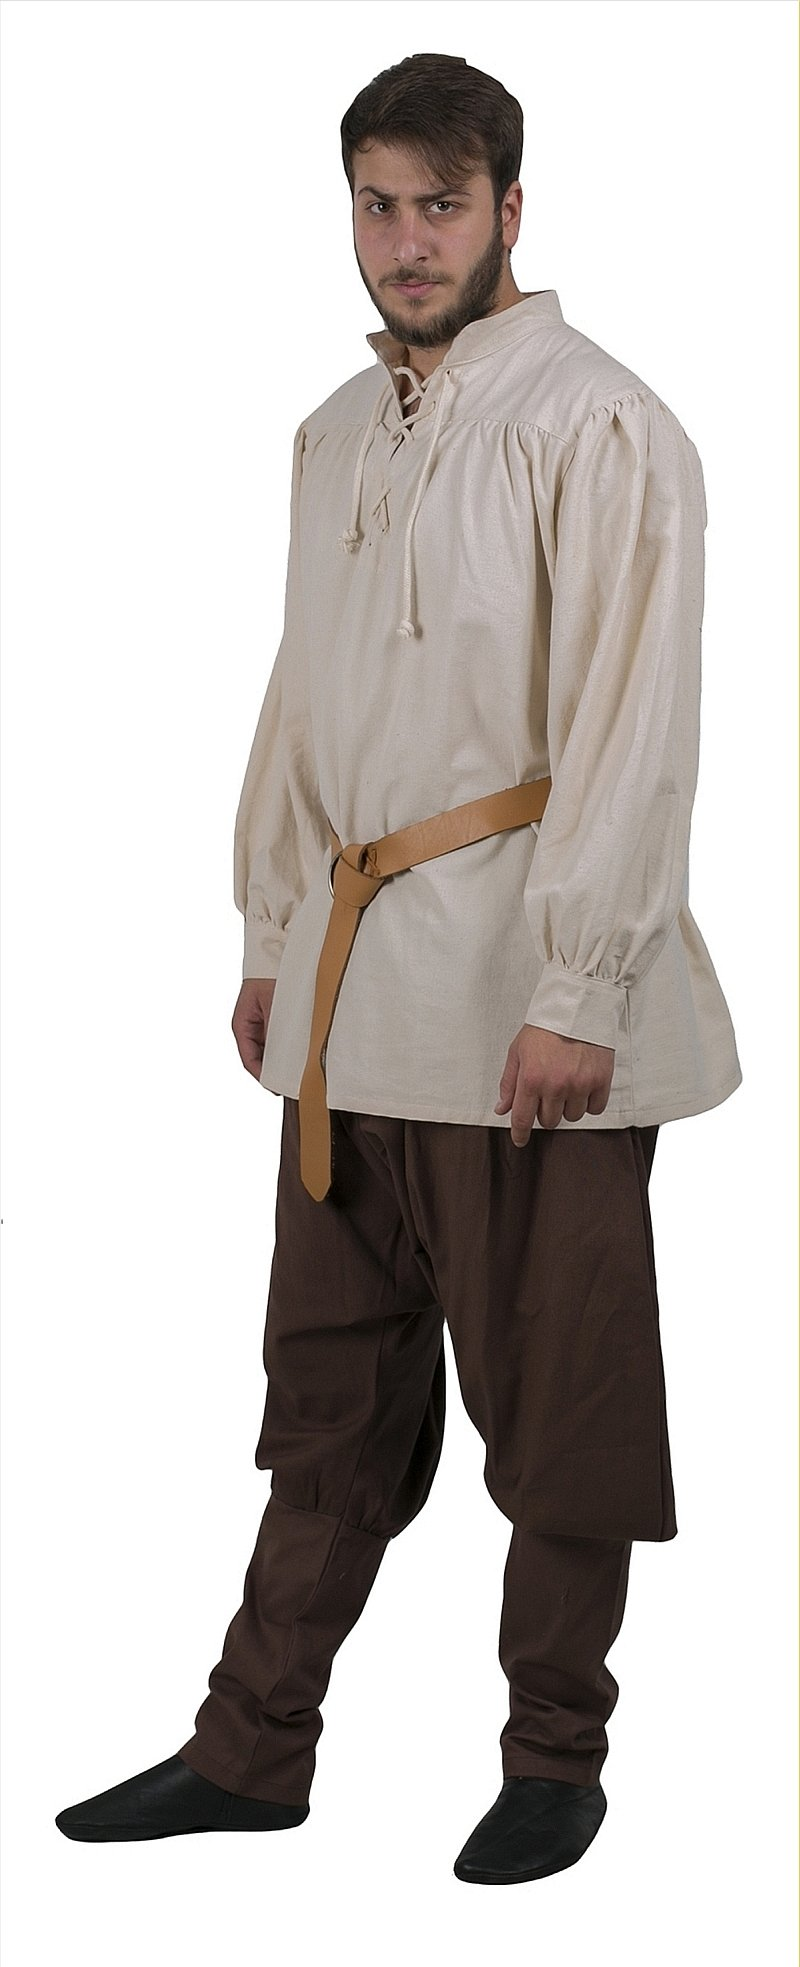 byCalvina - Calvina Costumes ERMES Medieval Viking LARP Pirate Cotton Man Shirt - Made in Turkey-Nat-2XL by byCalvina - Calvina Costumes (Image #6)